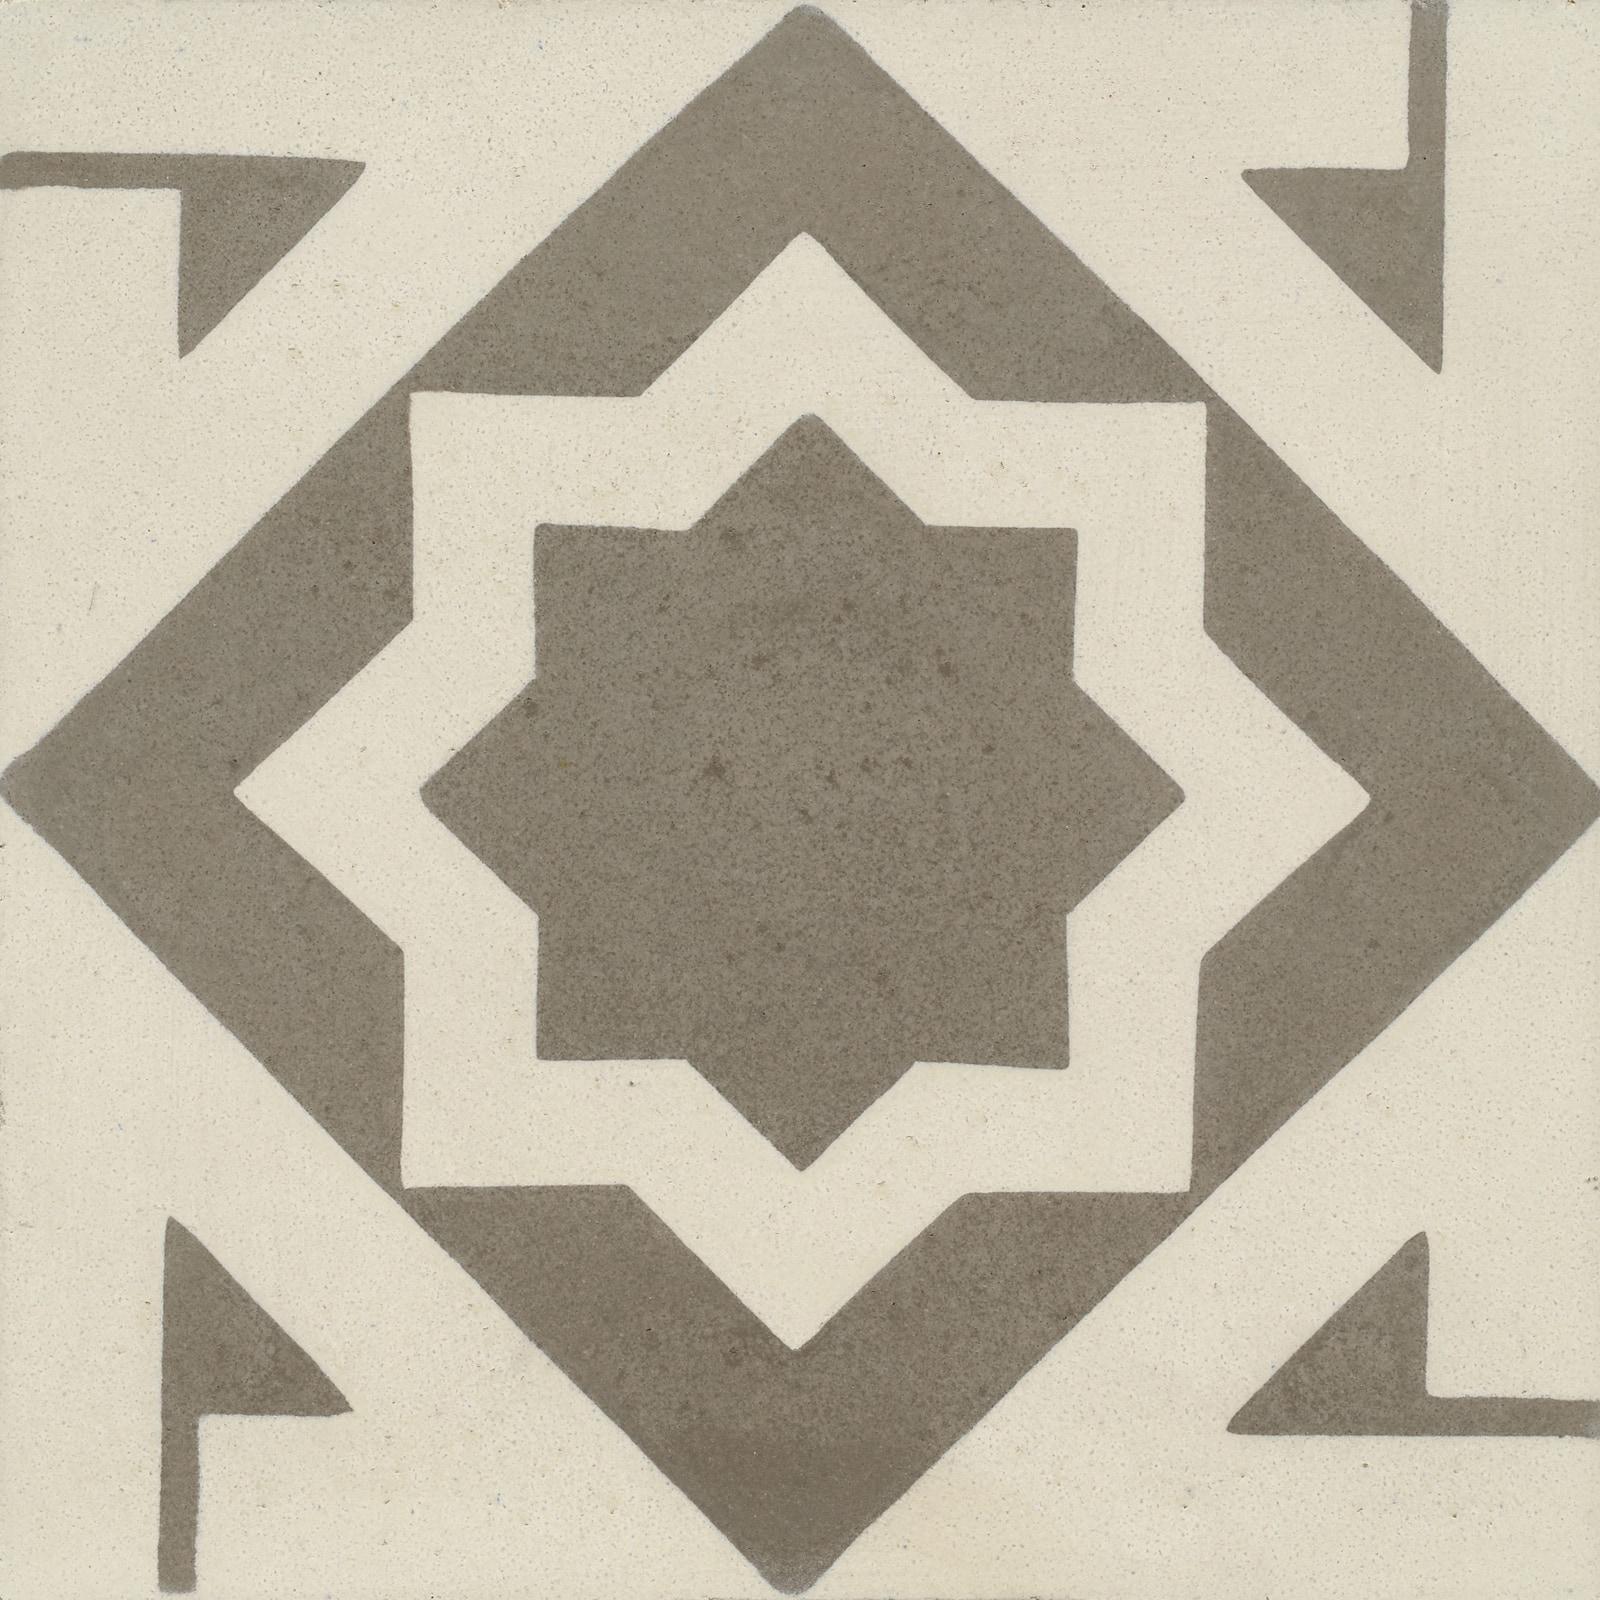 VIA-Zementmosaikplatten-nummer-51050-VIA-GmbH | 52050/168